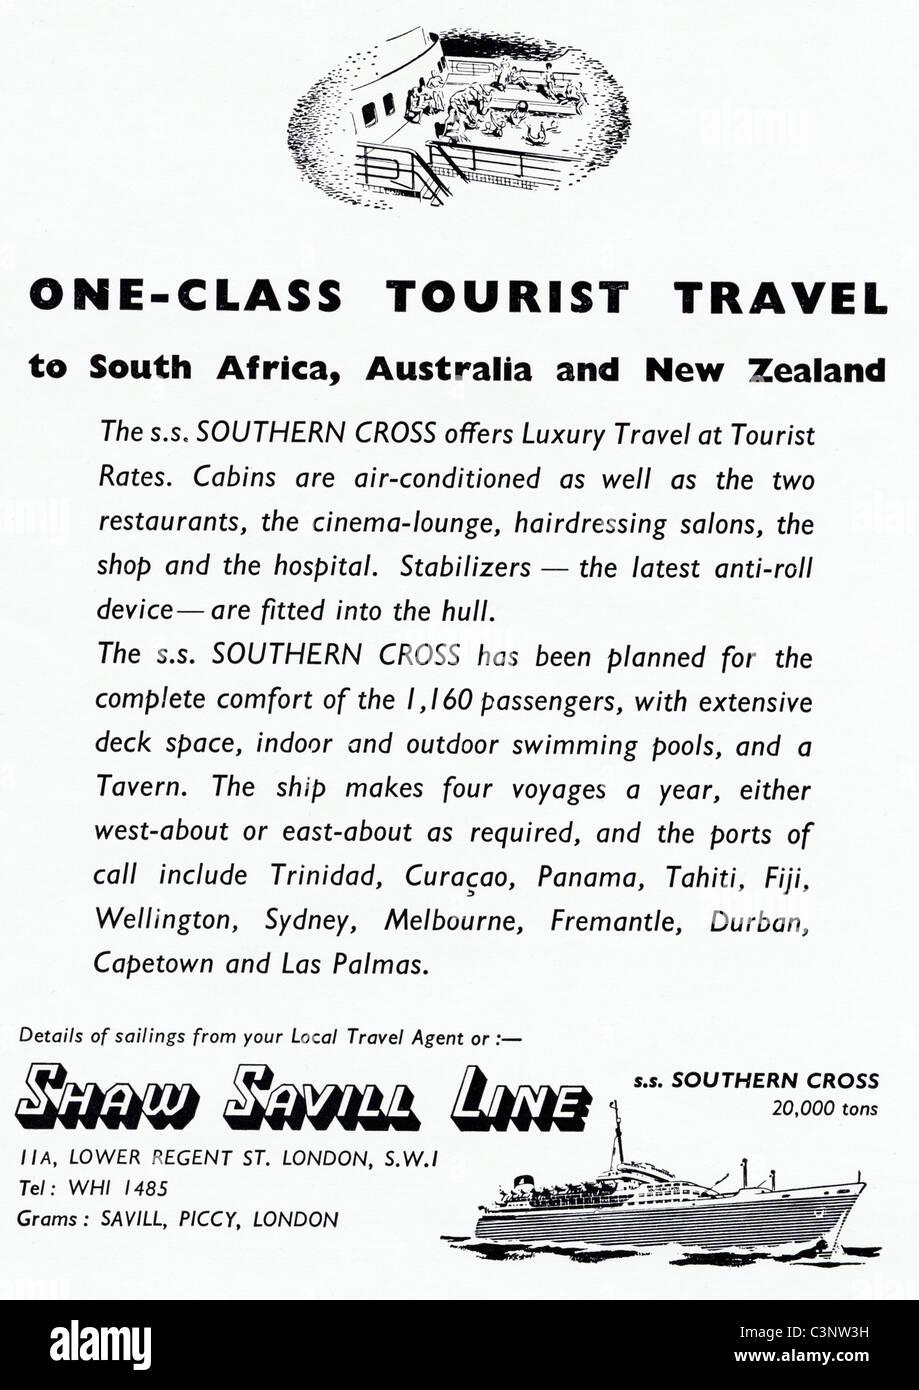 Original advertisement in magazine circa 1955 for SHAW SAVILL LINE tourist travel - Stock Image